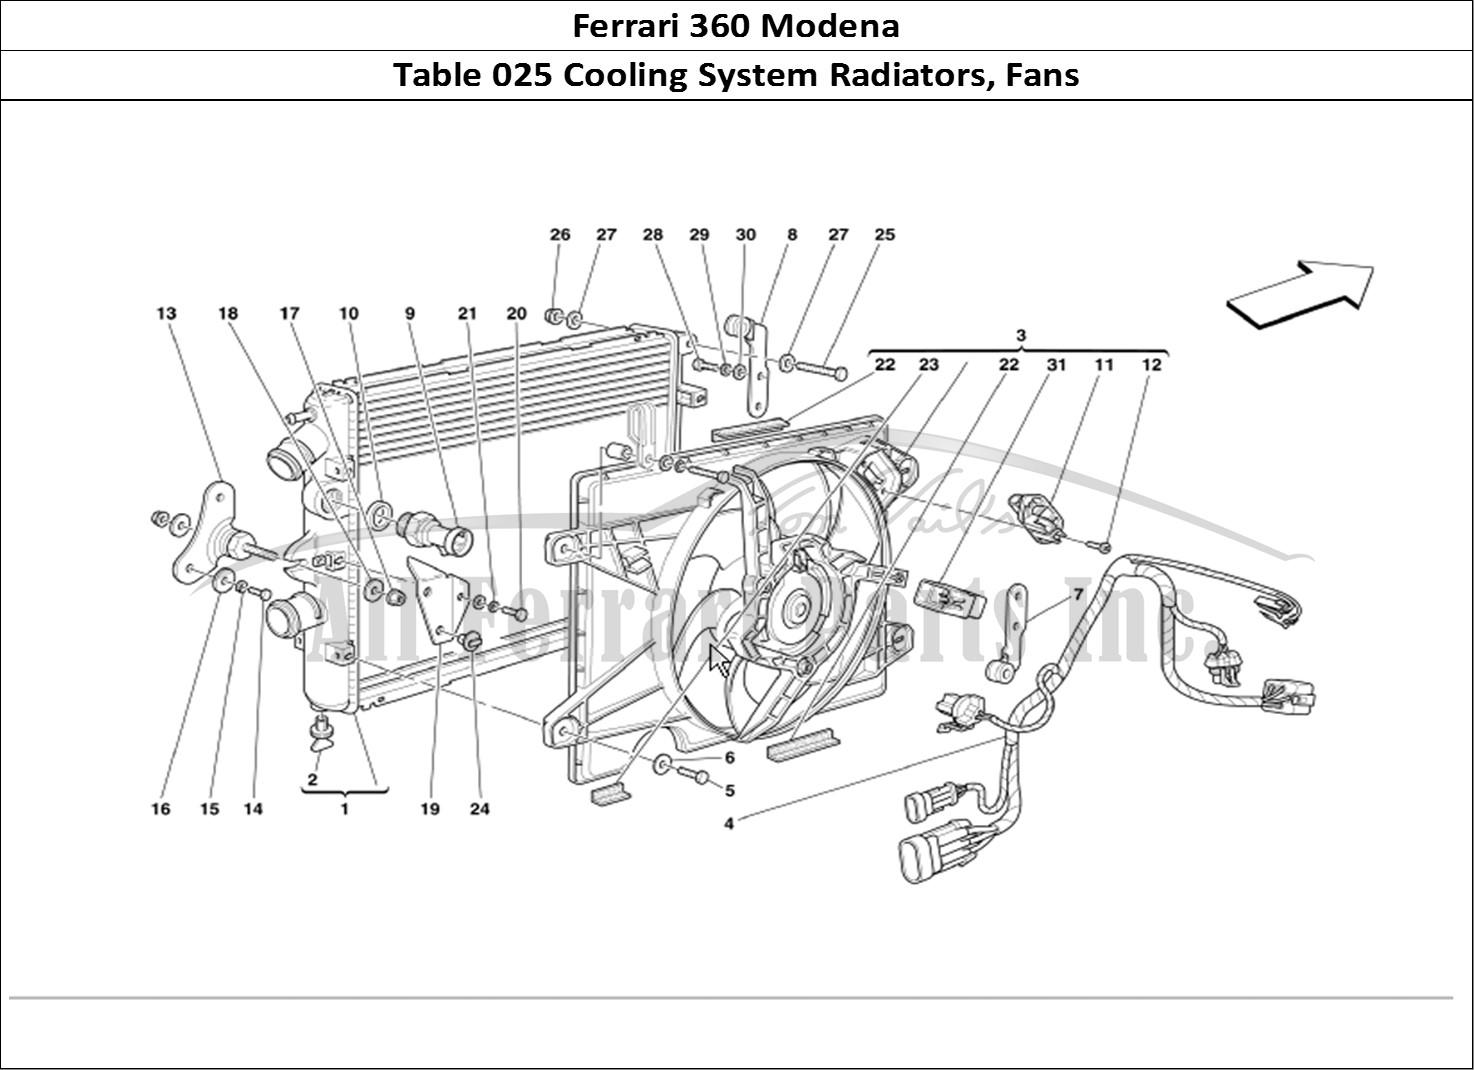 Buy Original Ferrari 360 Modena 025 Cooling System